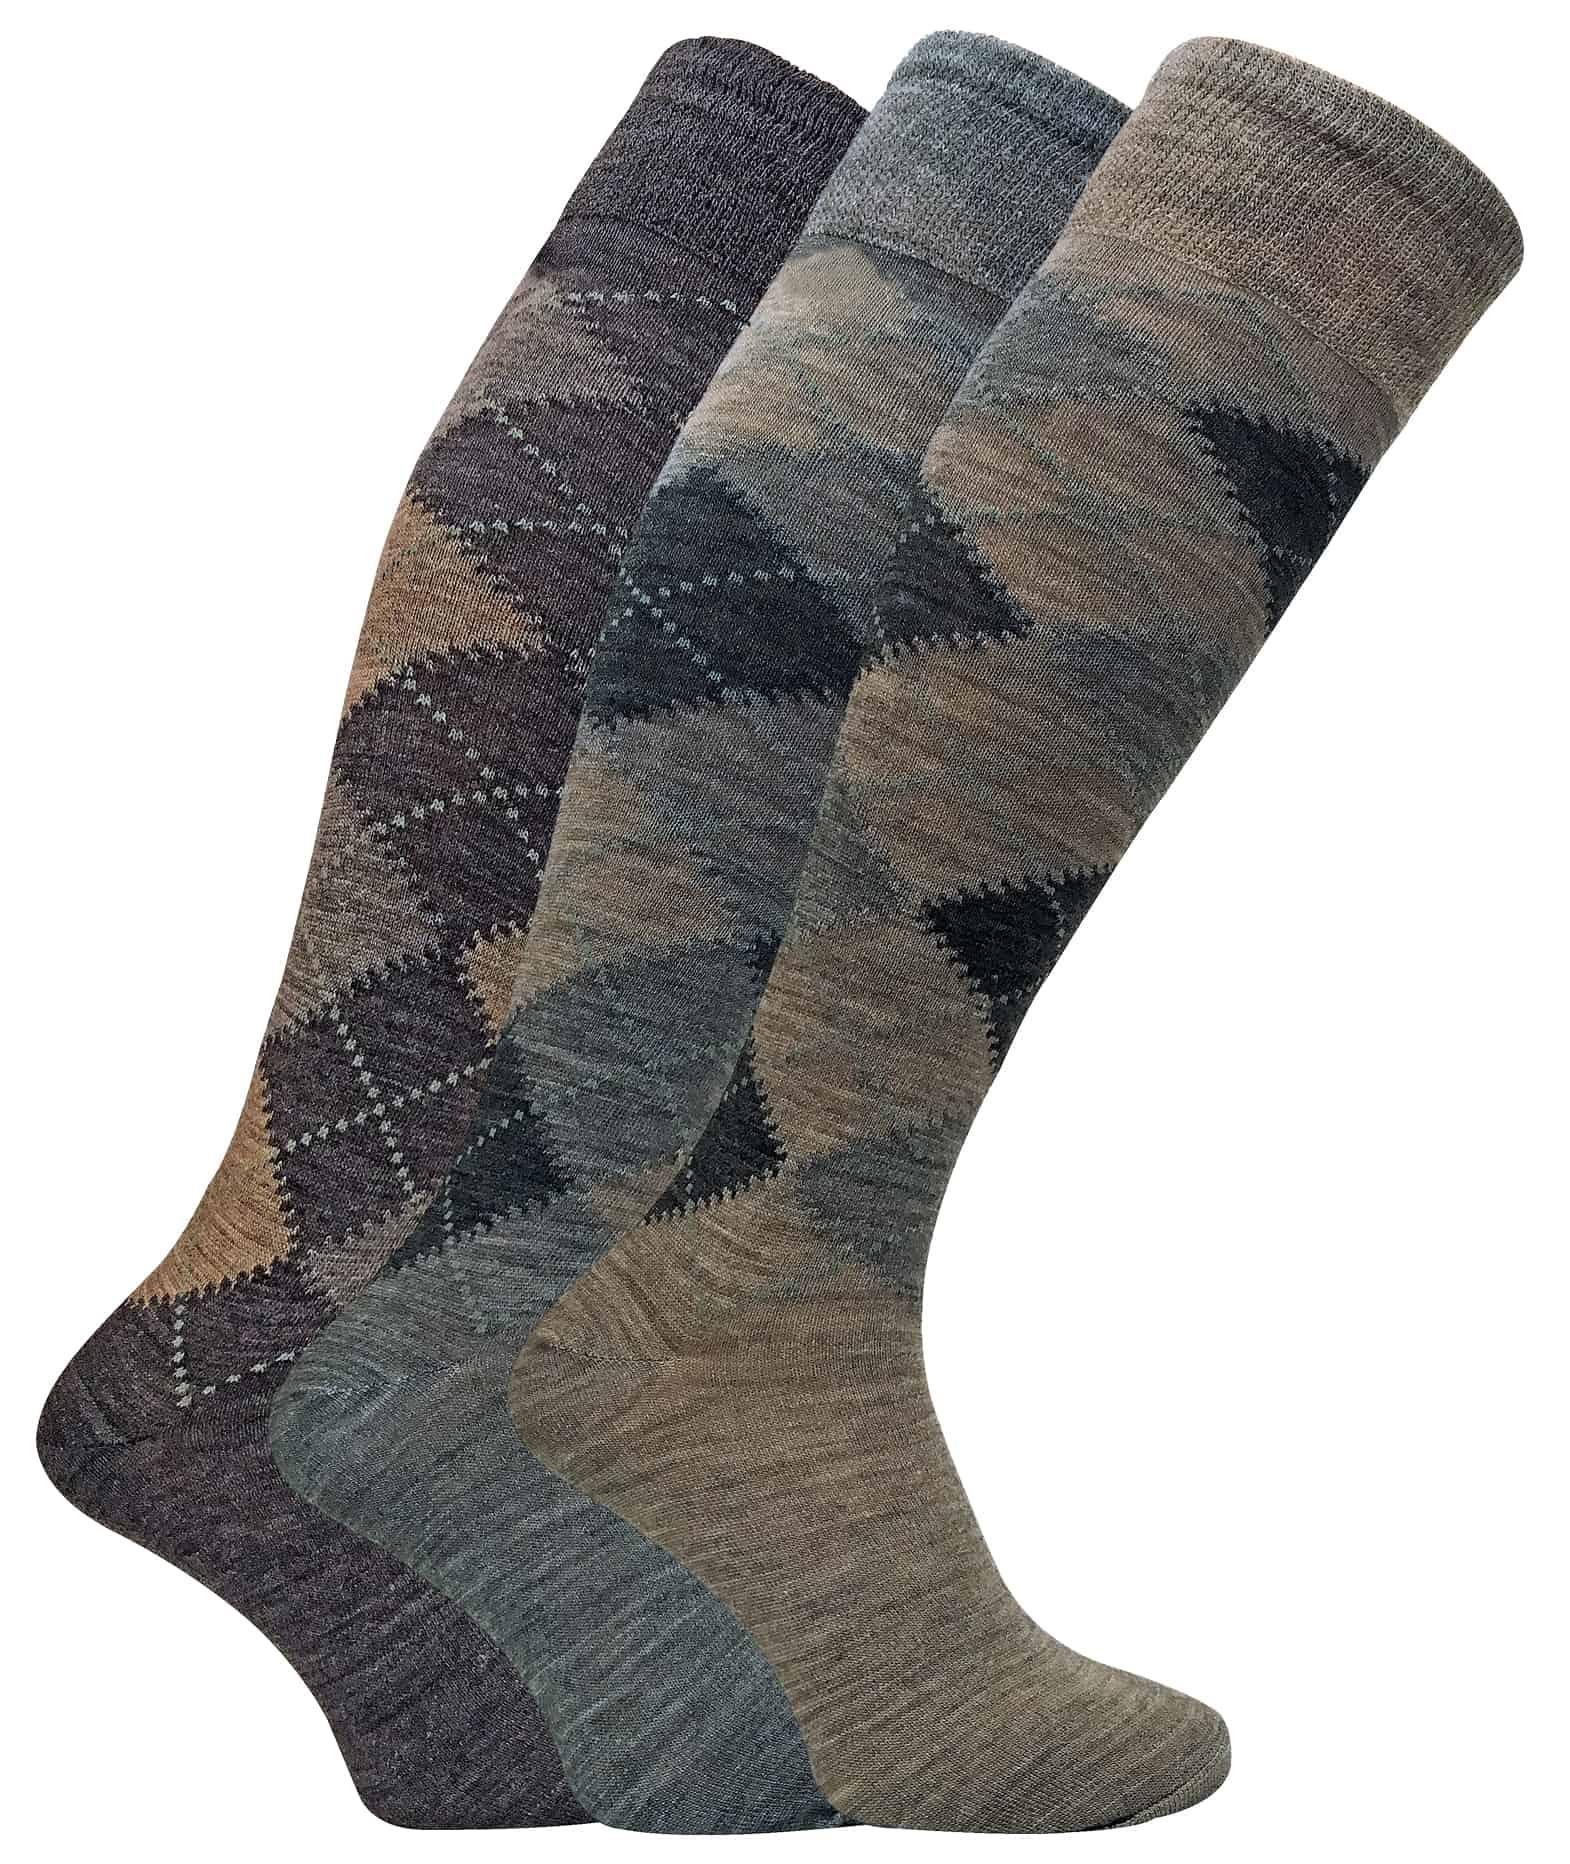 3 Pack Men's Extra Long Knee High Argyle Lambs Wool Socks - 6-11 UK, ELLW Brown